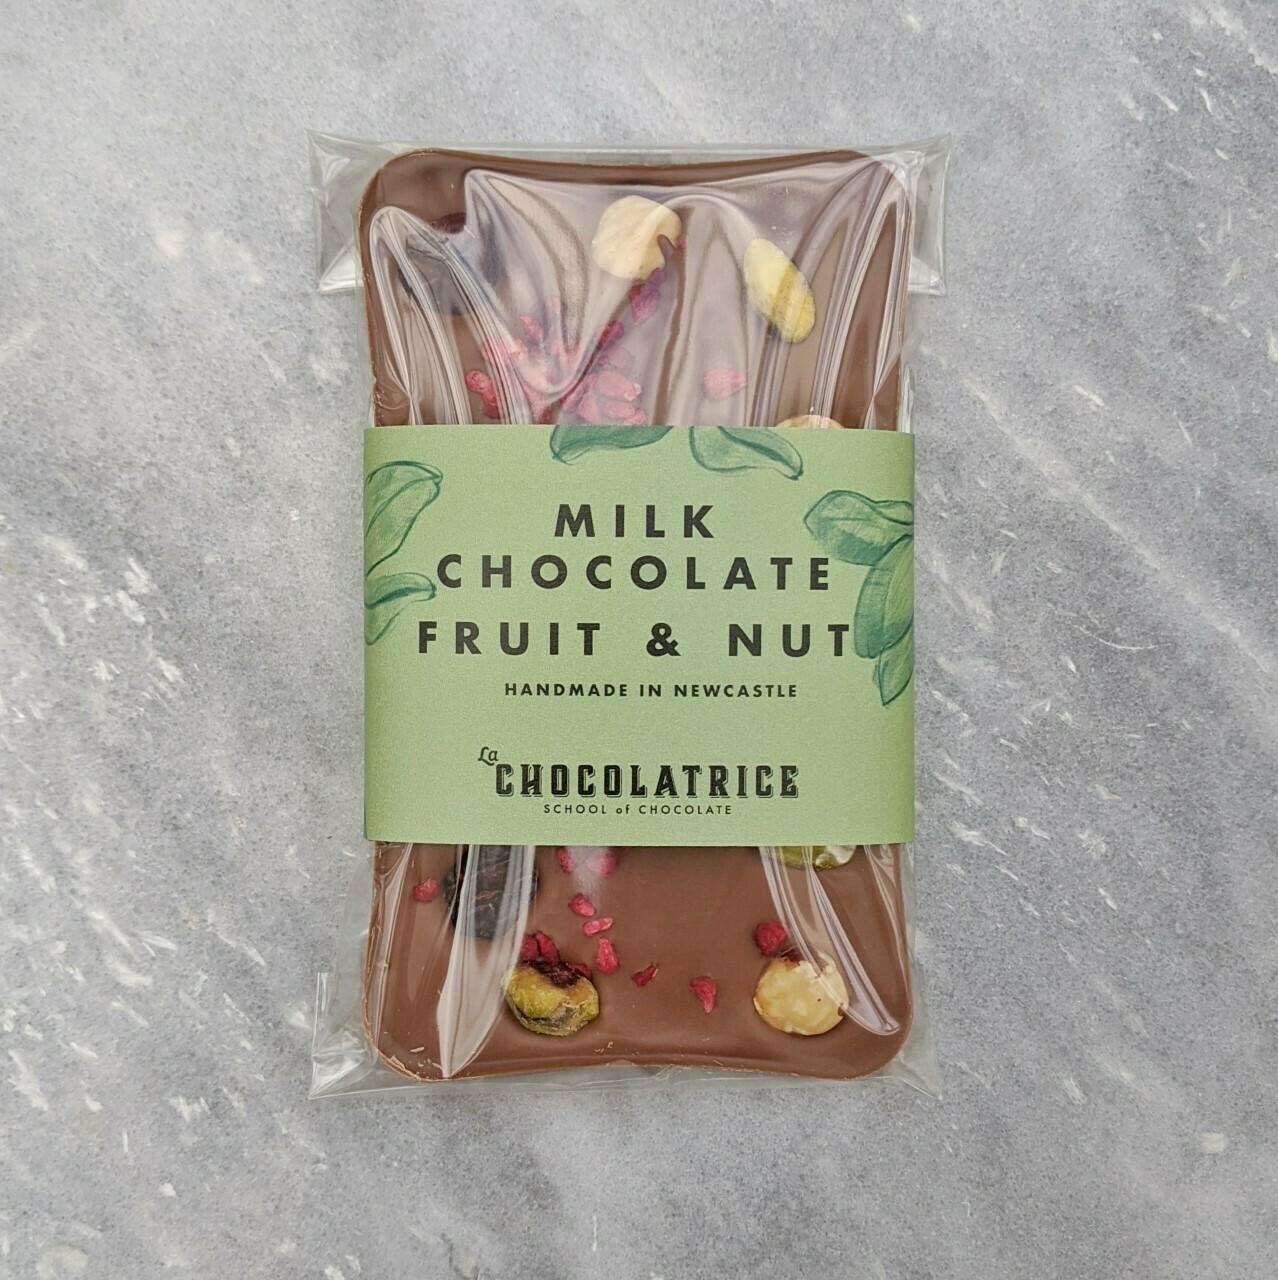 Milk Chocolate Fruit and Nut